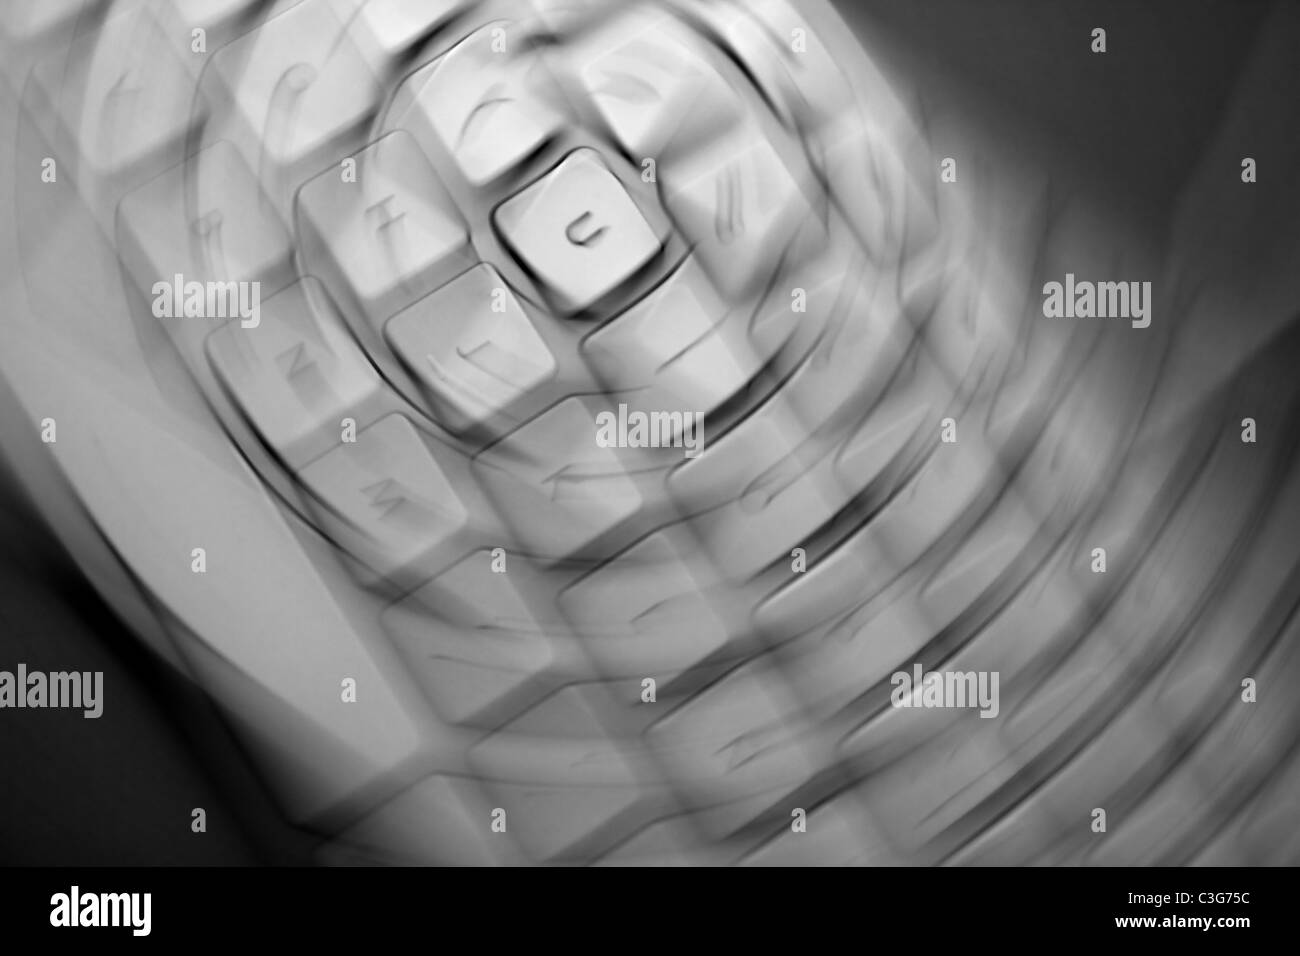 crazy keyborad motion blurred keys as a disease metaphor - Stock Image